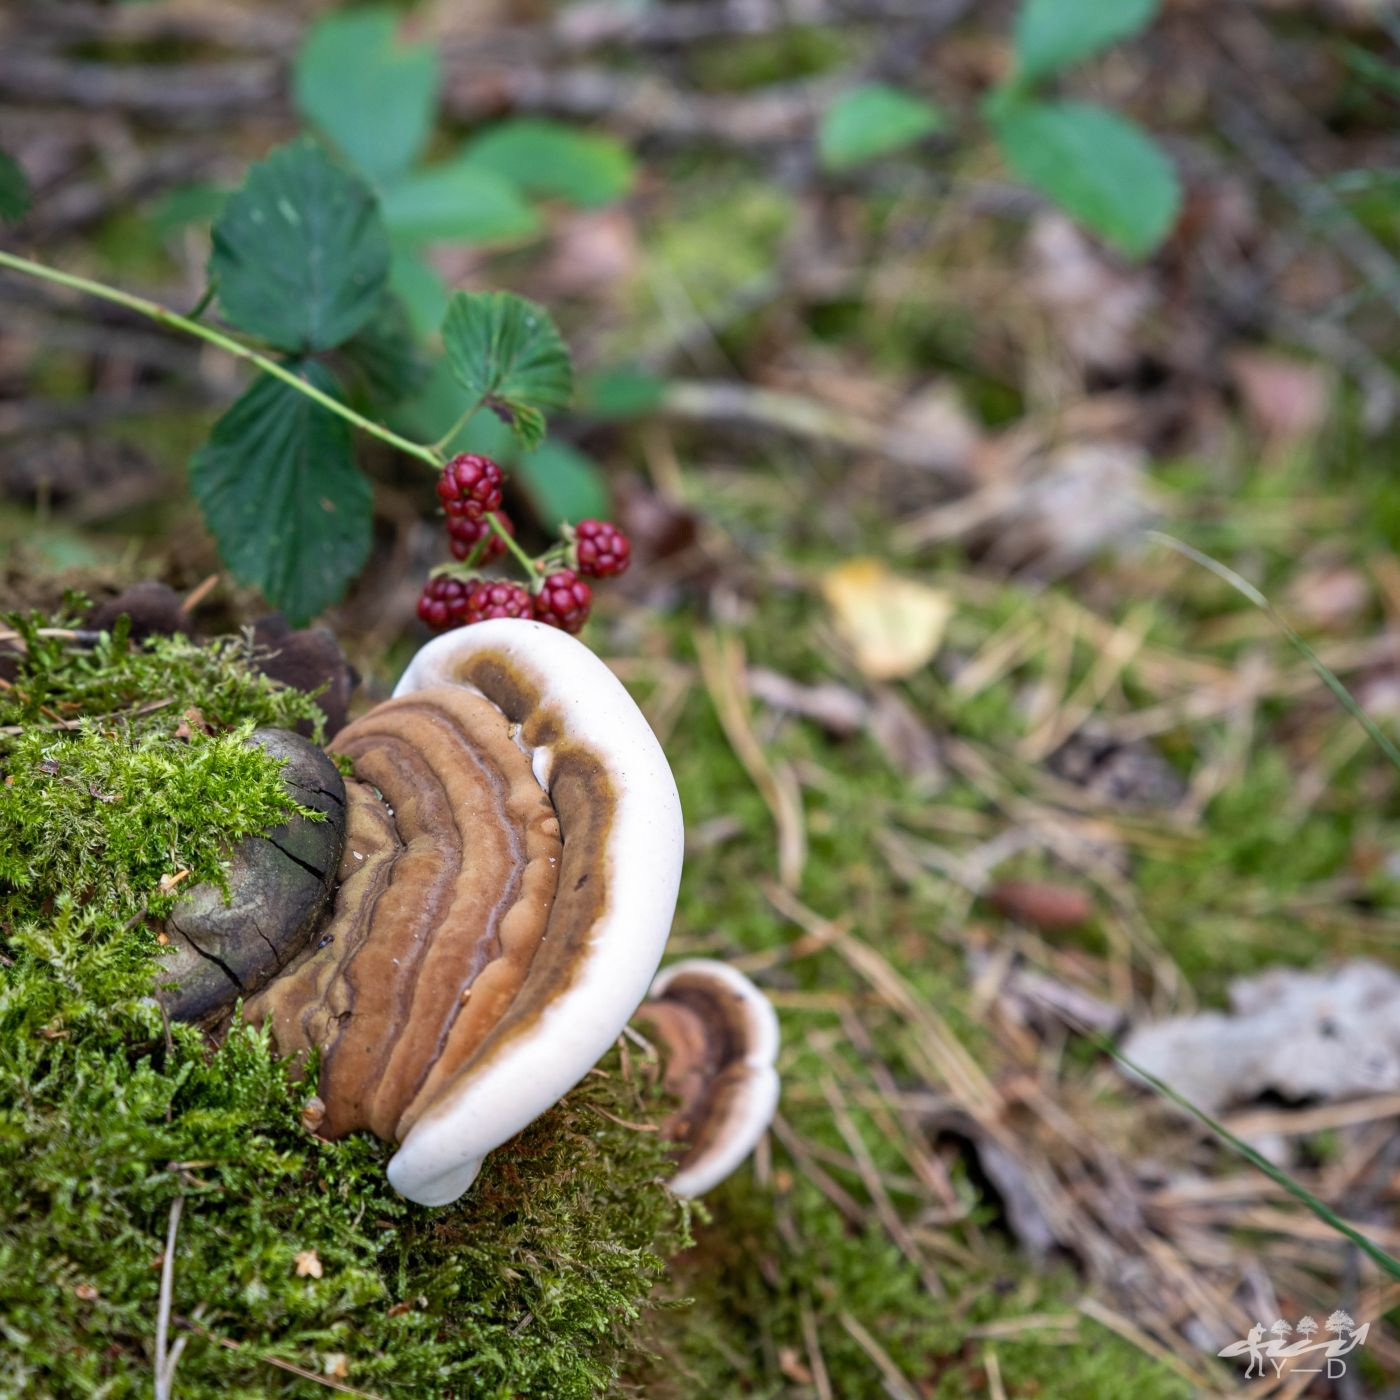 Parc national de Haute Campine - Mechelse heide, Belgium